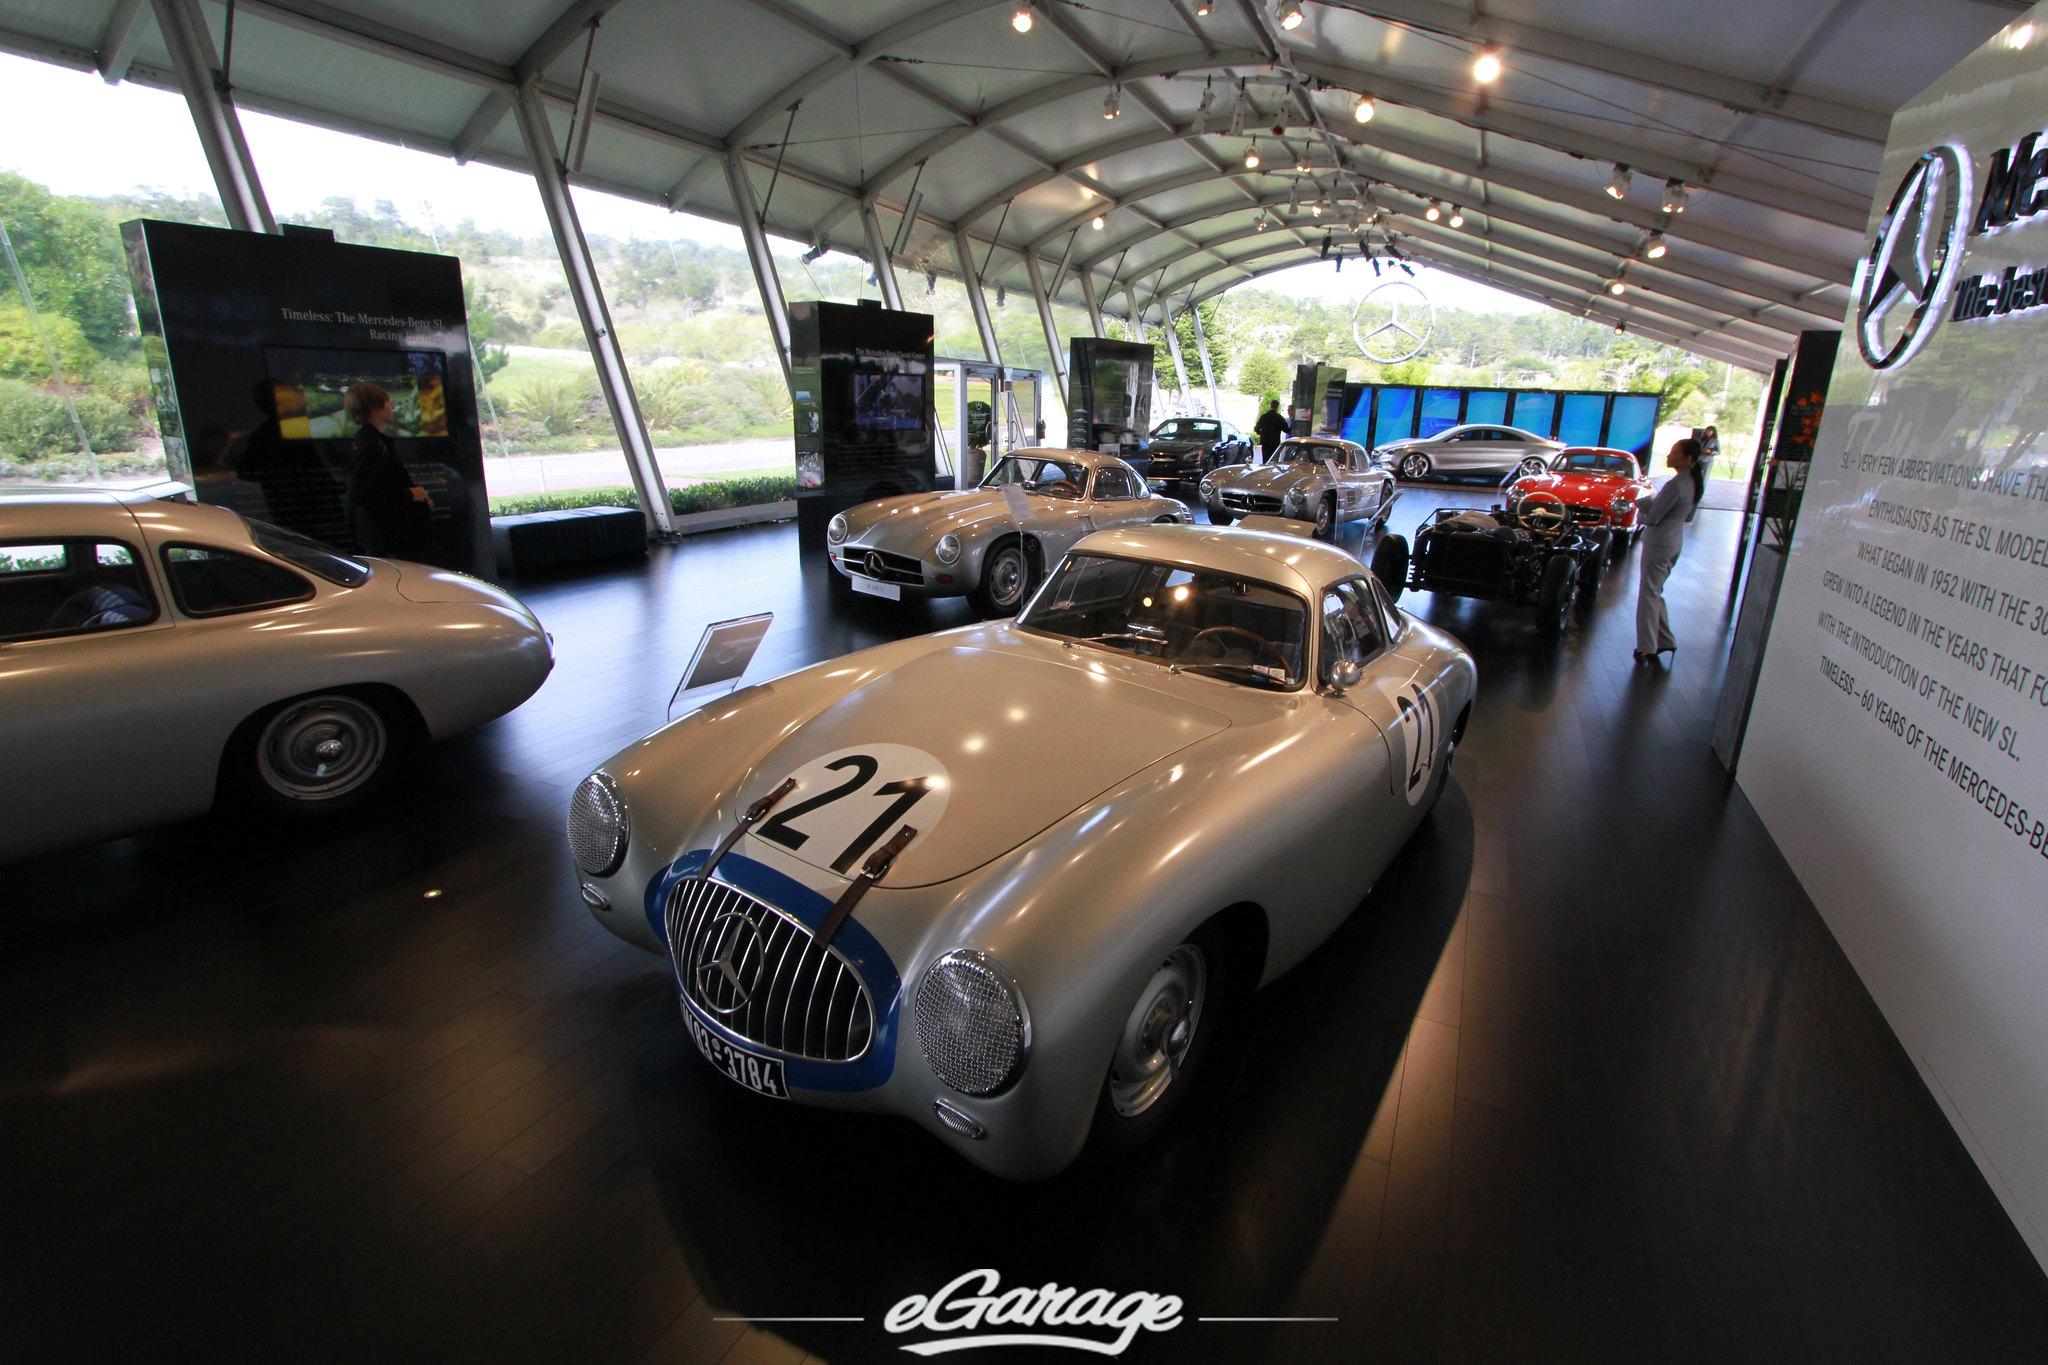 7828943514 b45045108b k Mercedes Benz Classic